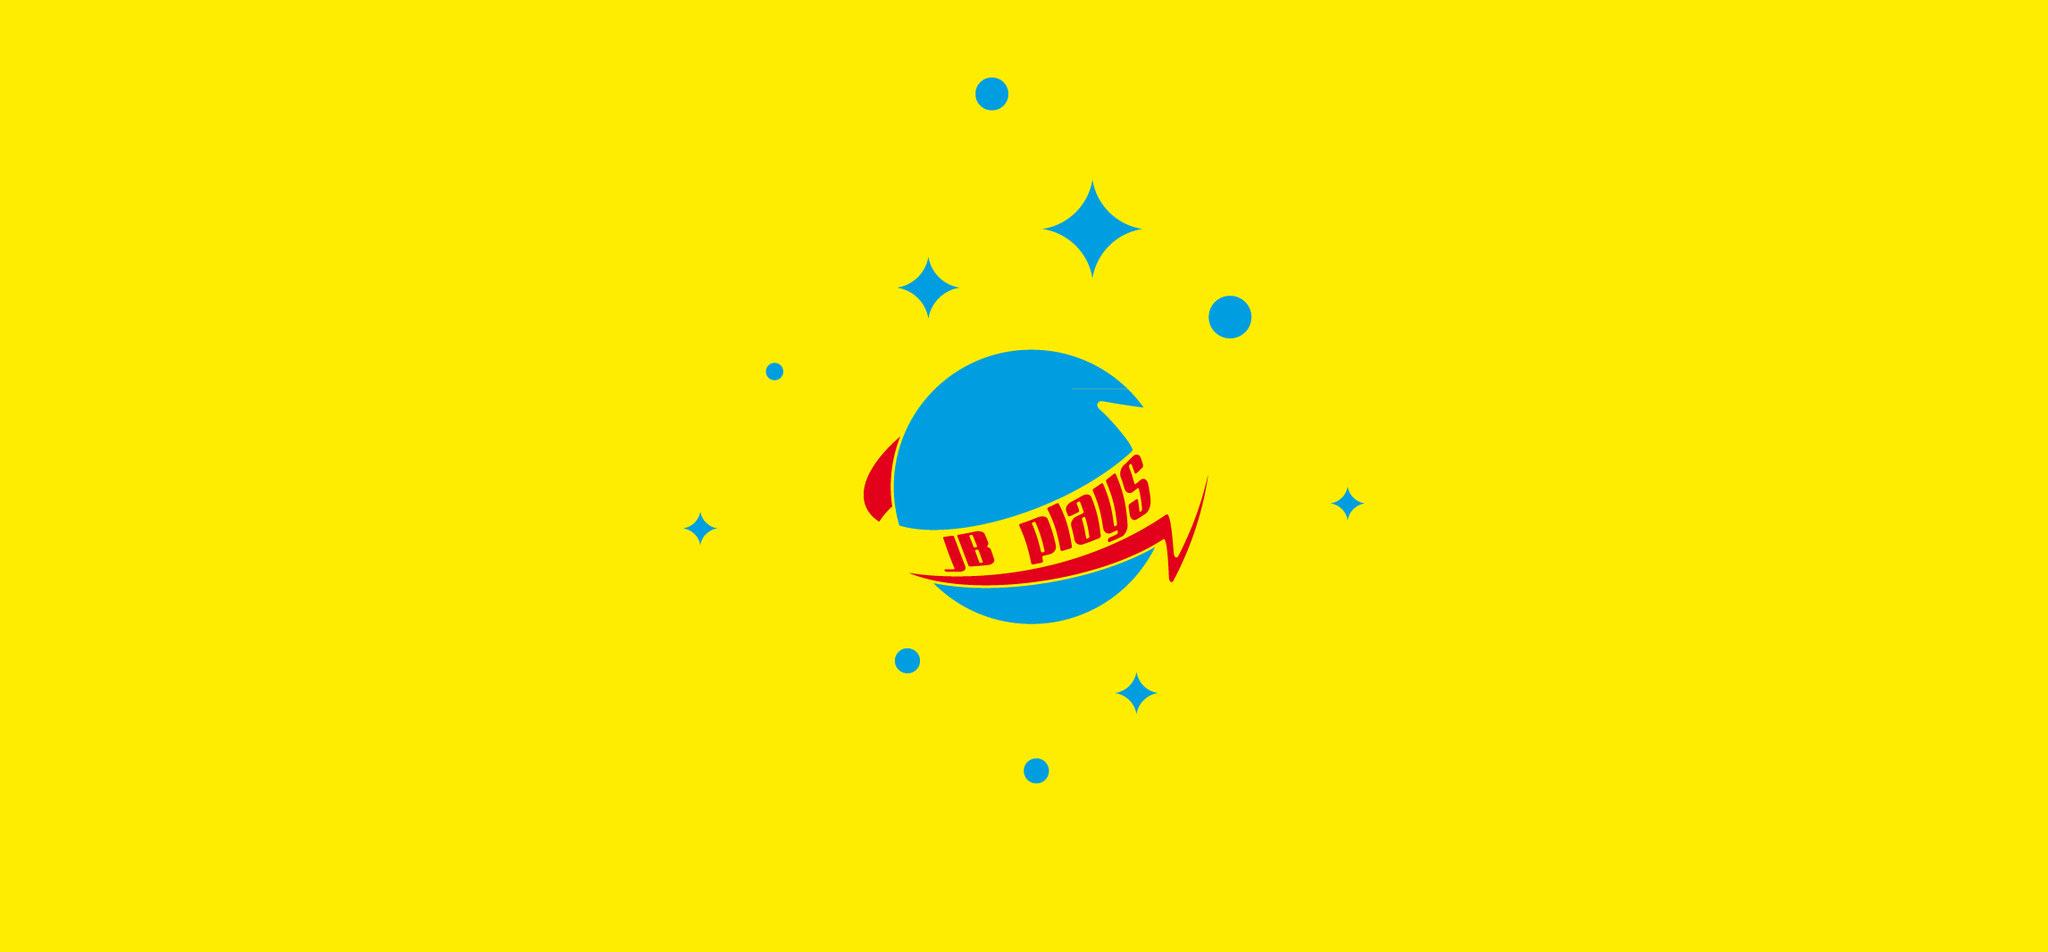 JAN BEHRENS | logo JB plays in anwendung – infragrau, gute gestaltung